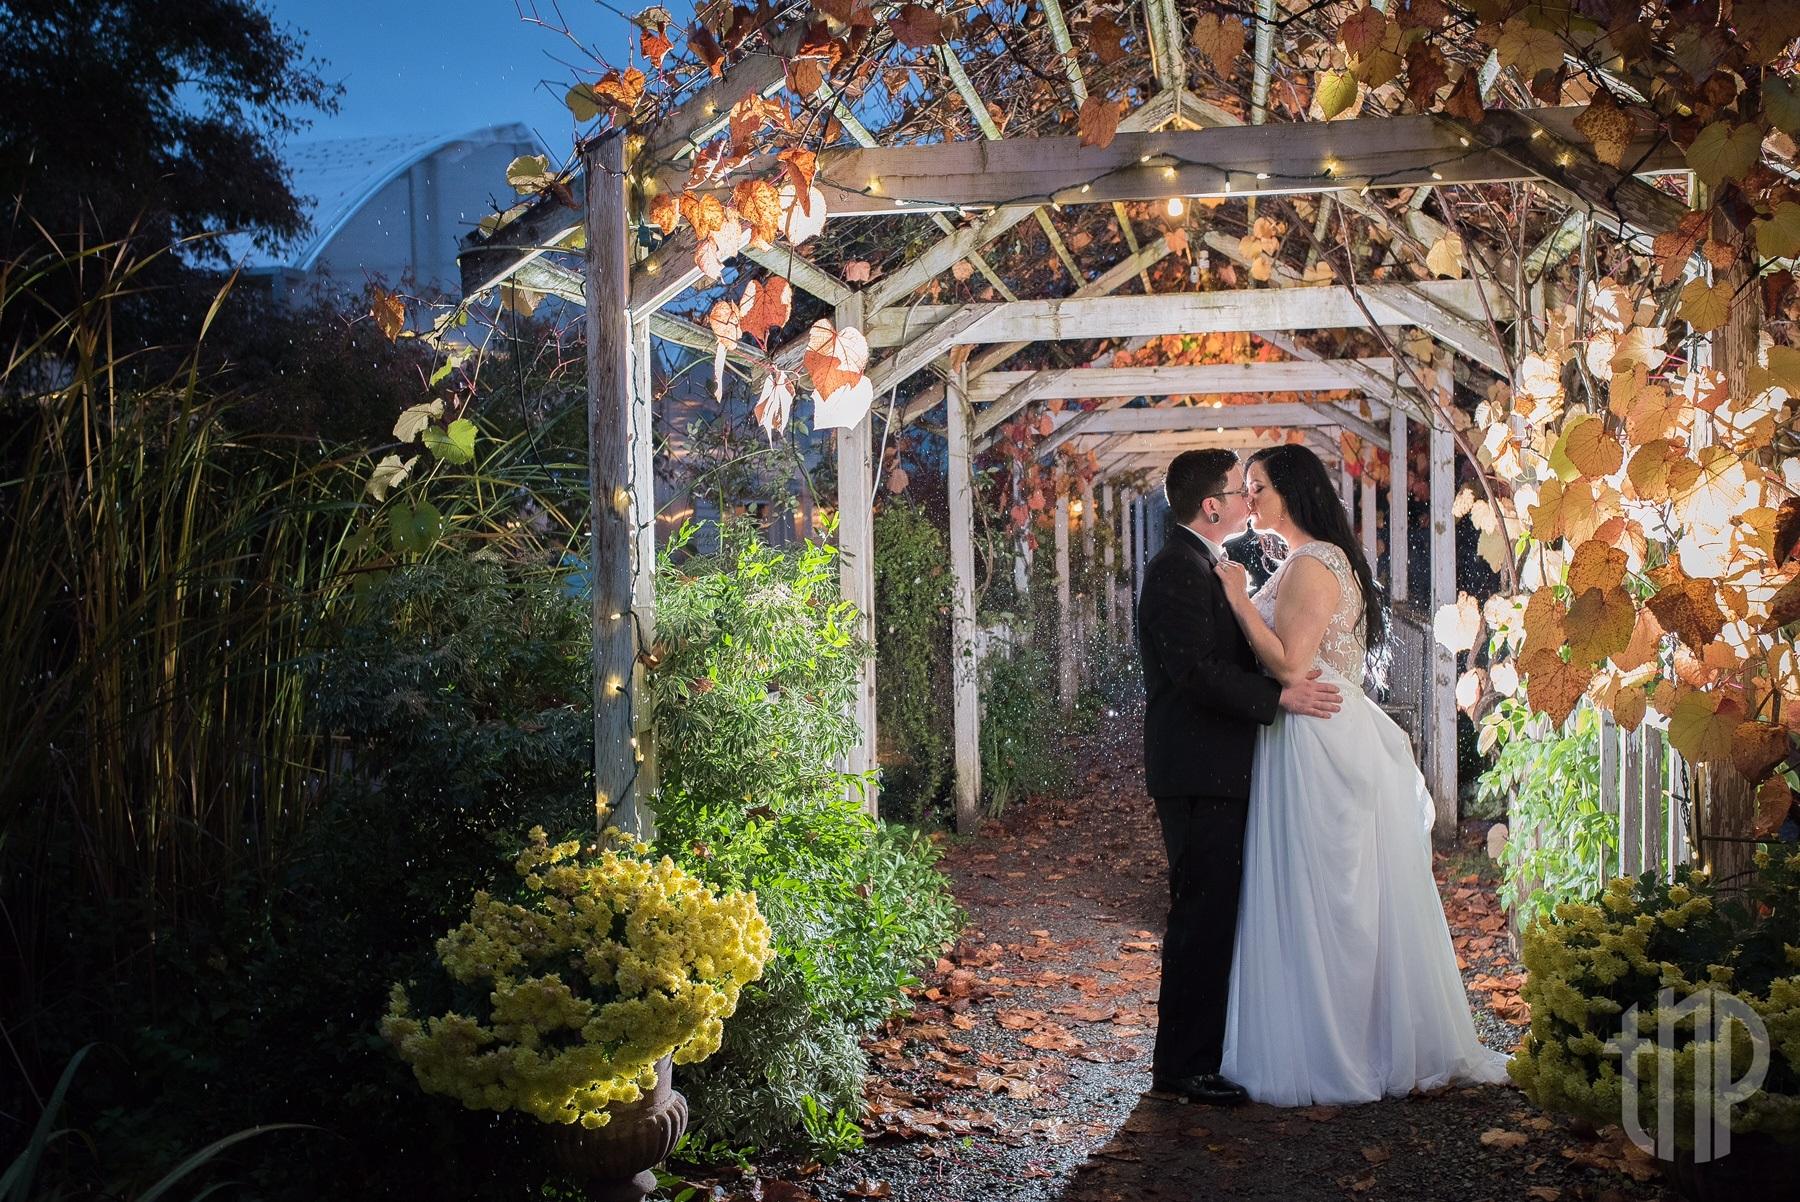 James & Renee's Fall wedding